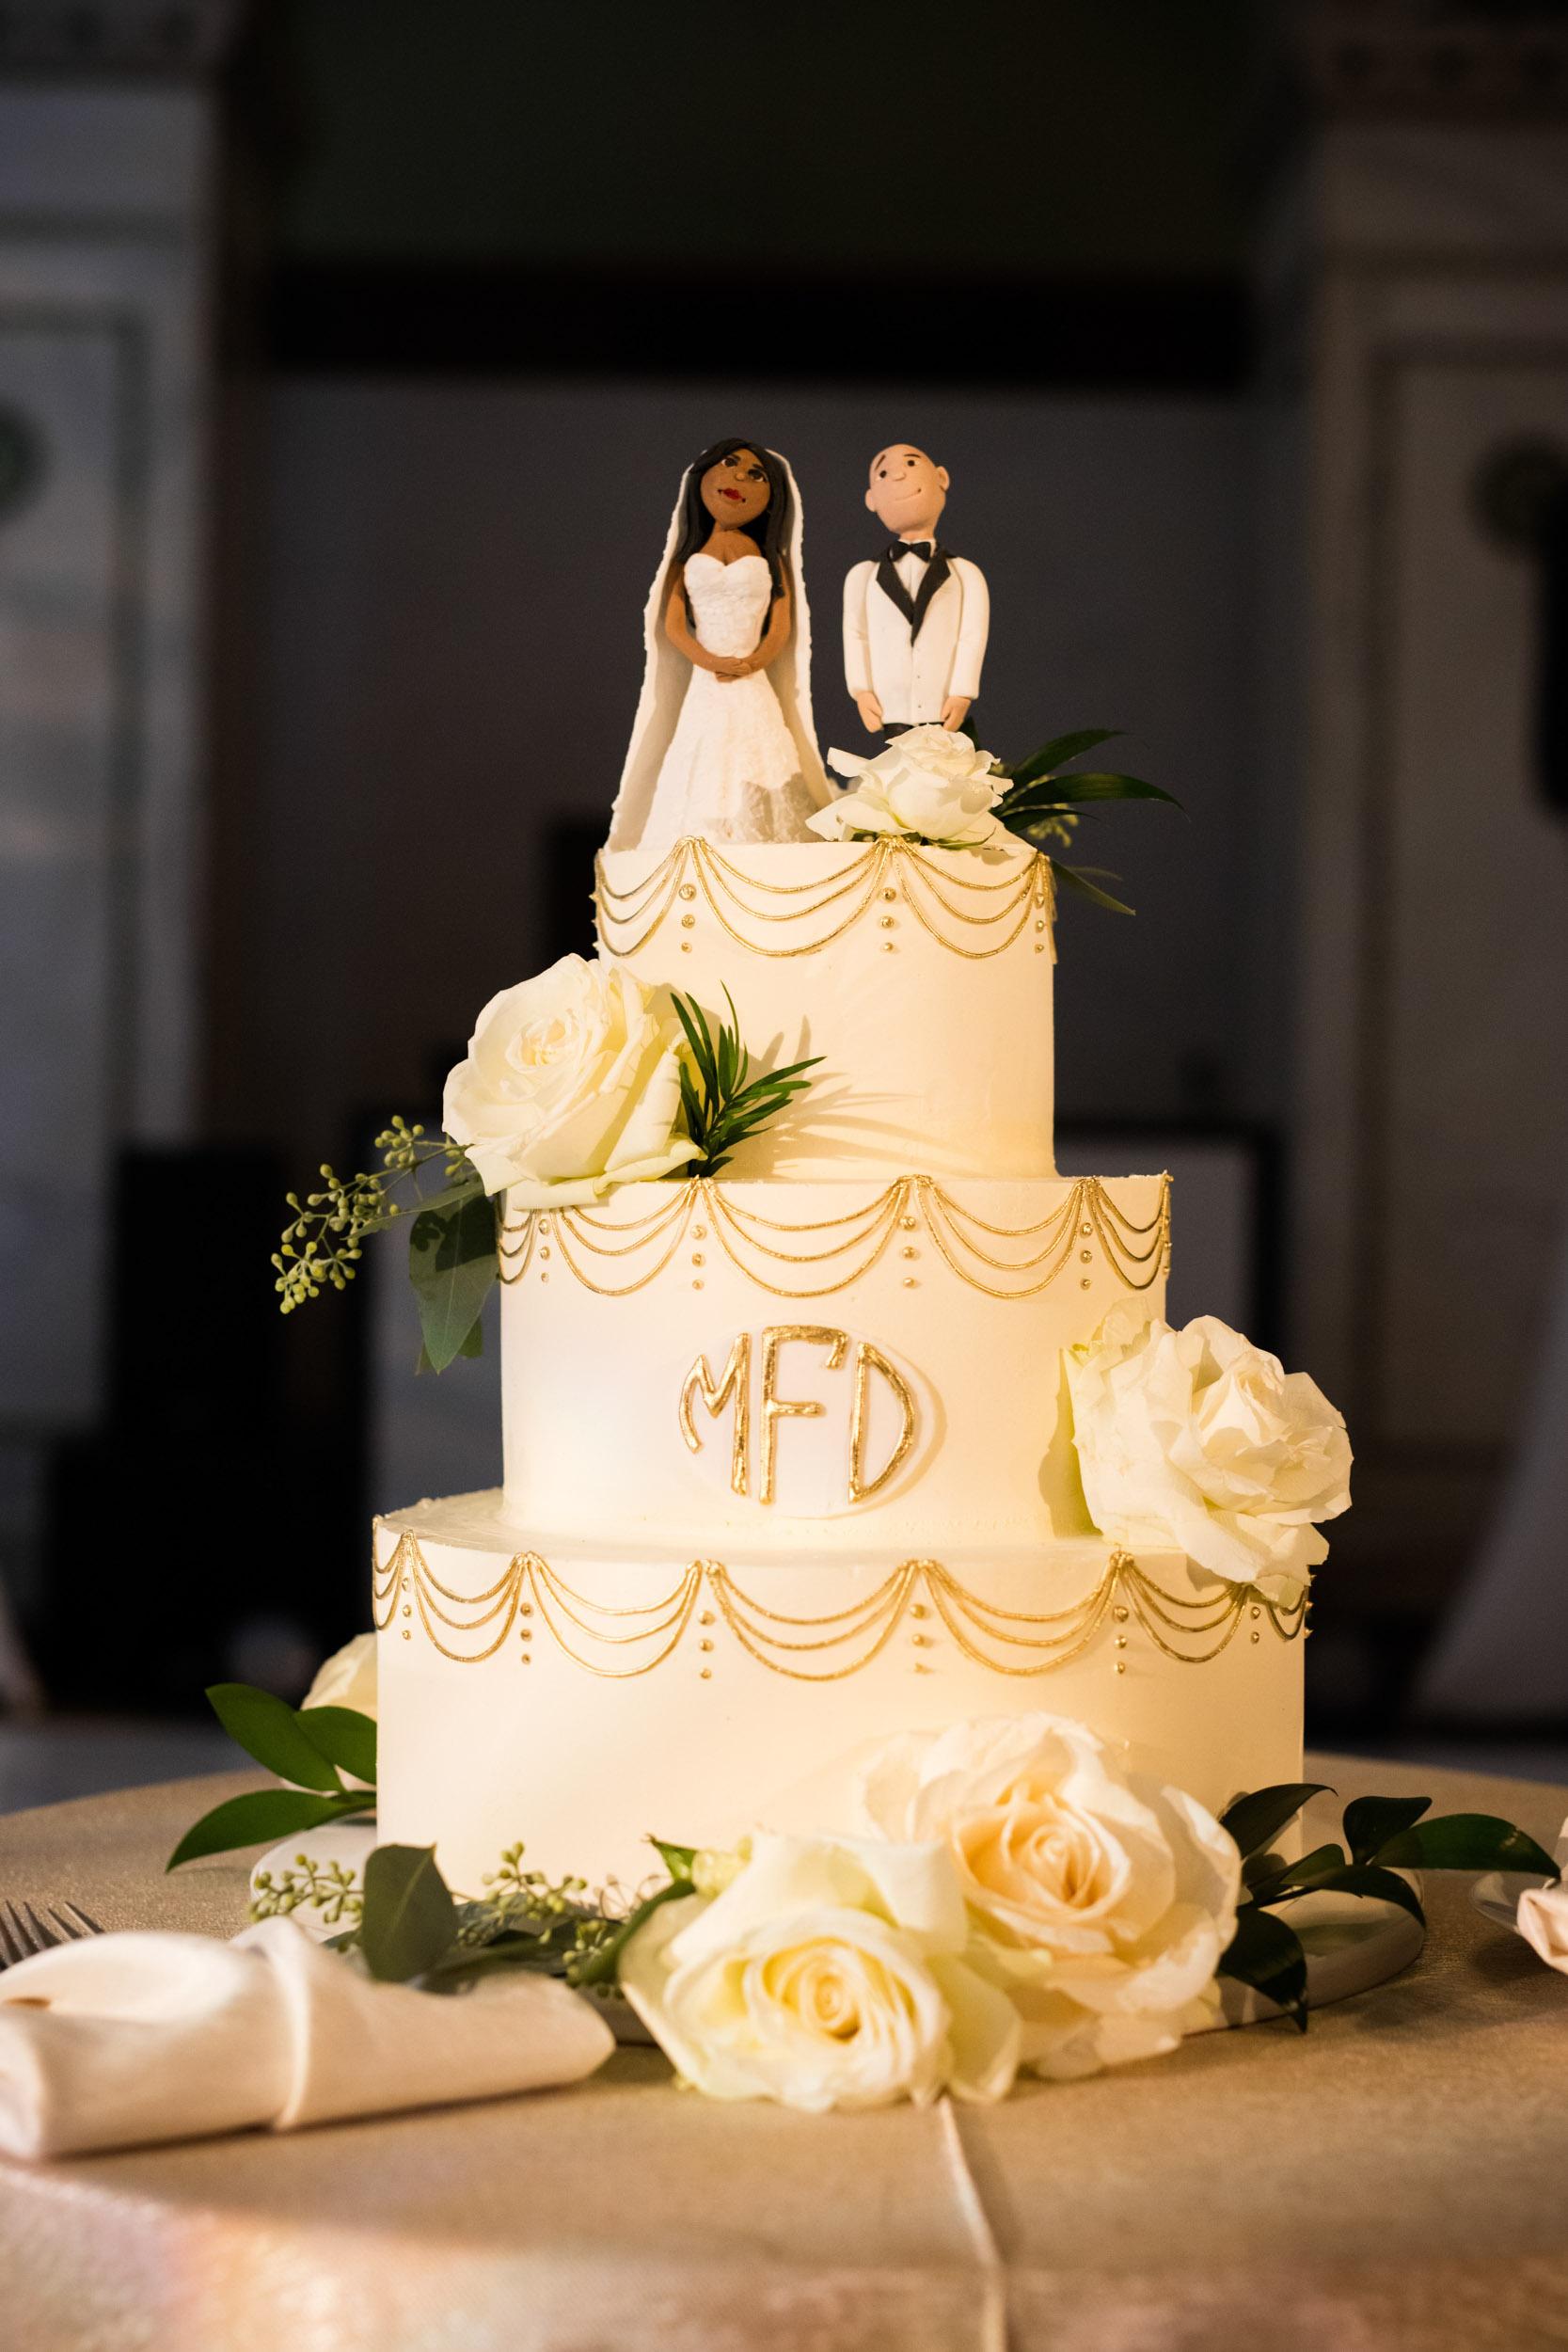 Alliance Bakery Cake for Chicago Cultural Center Wedding